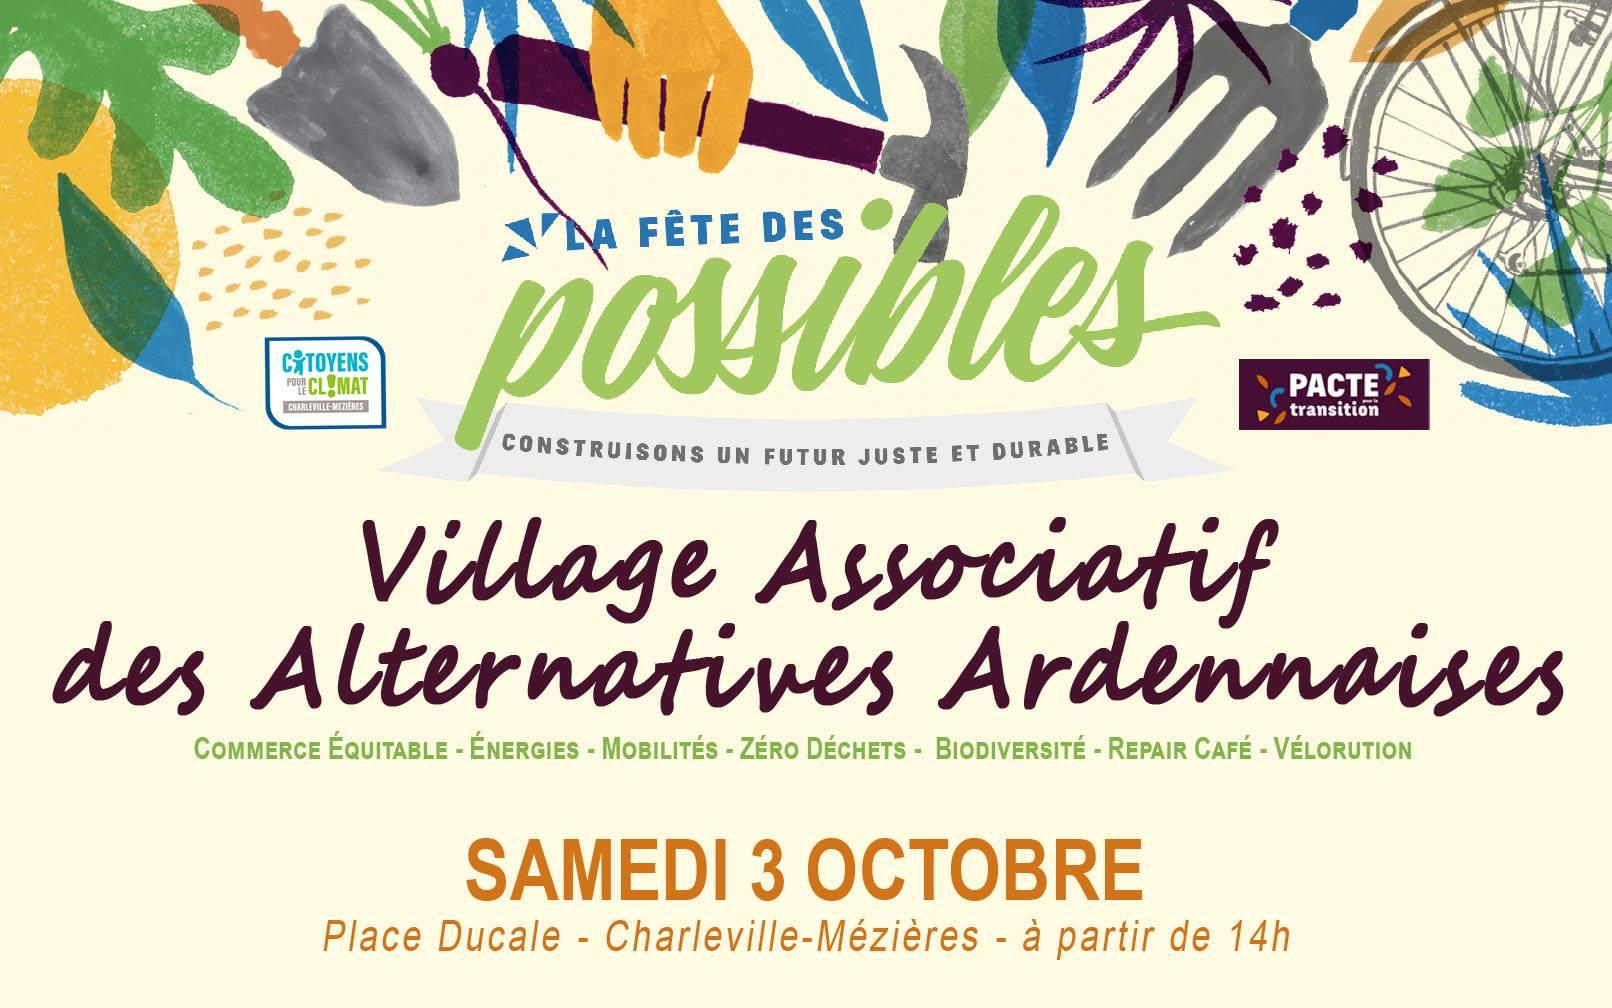 Village associatif et alternatif Ardennais